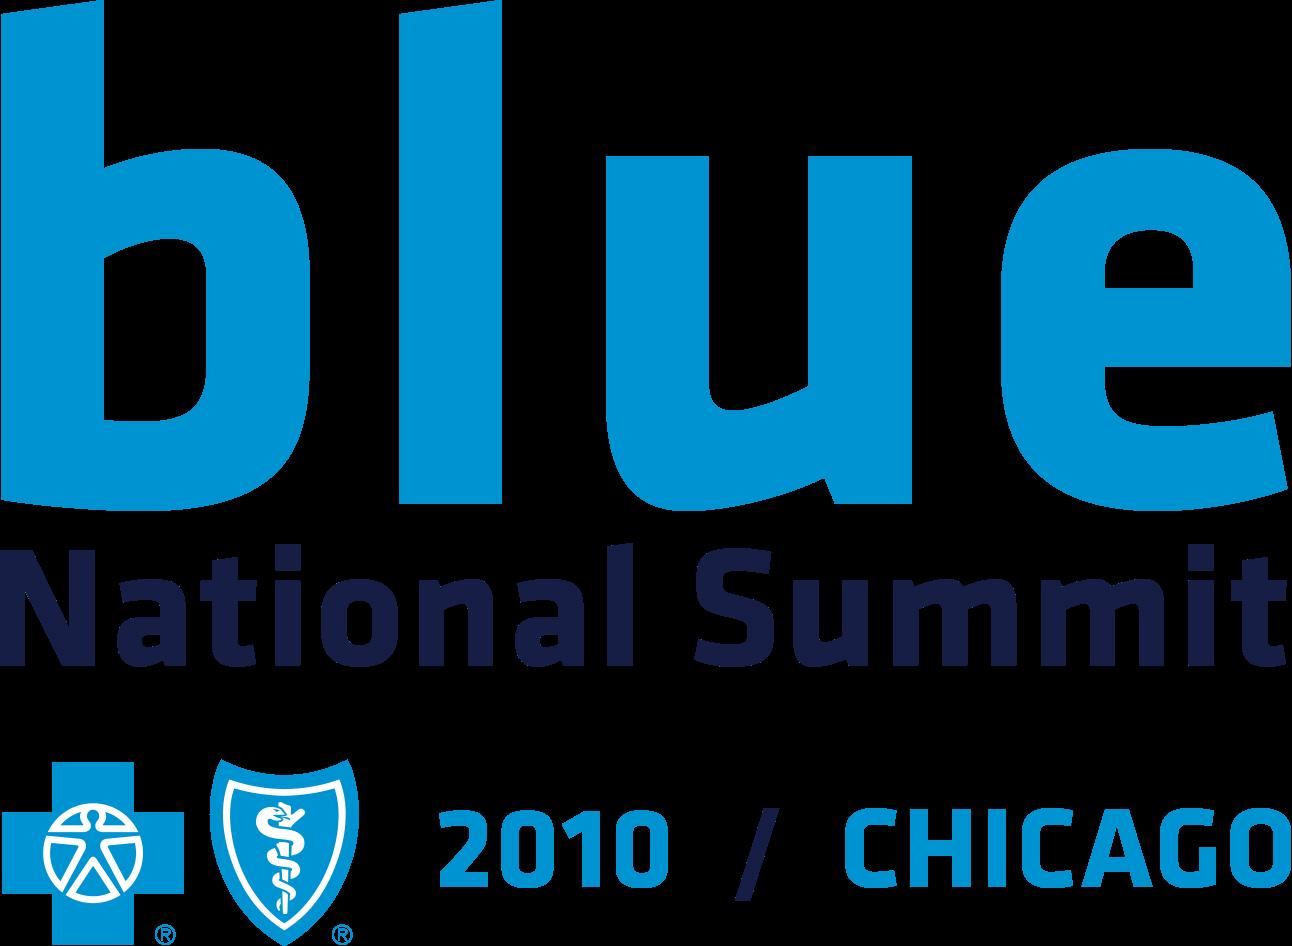 Blue Cross Blue Shield National Summit 2010 - Branding, Graphic Design, Logo